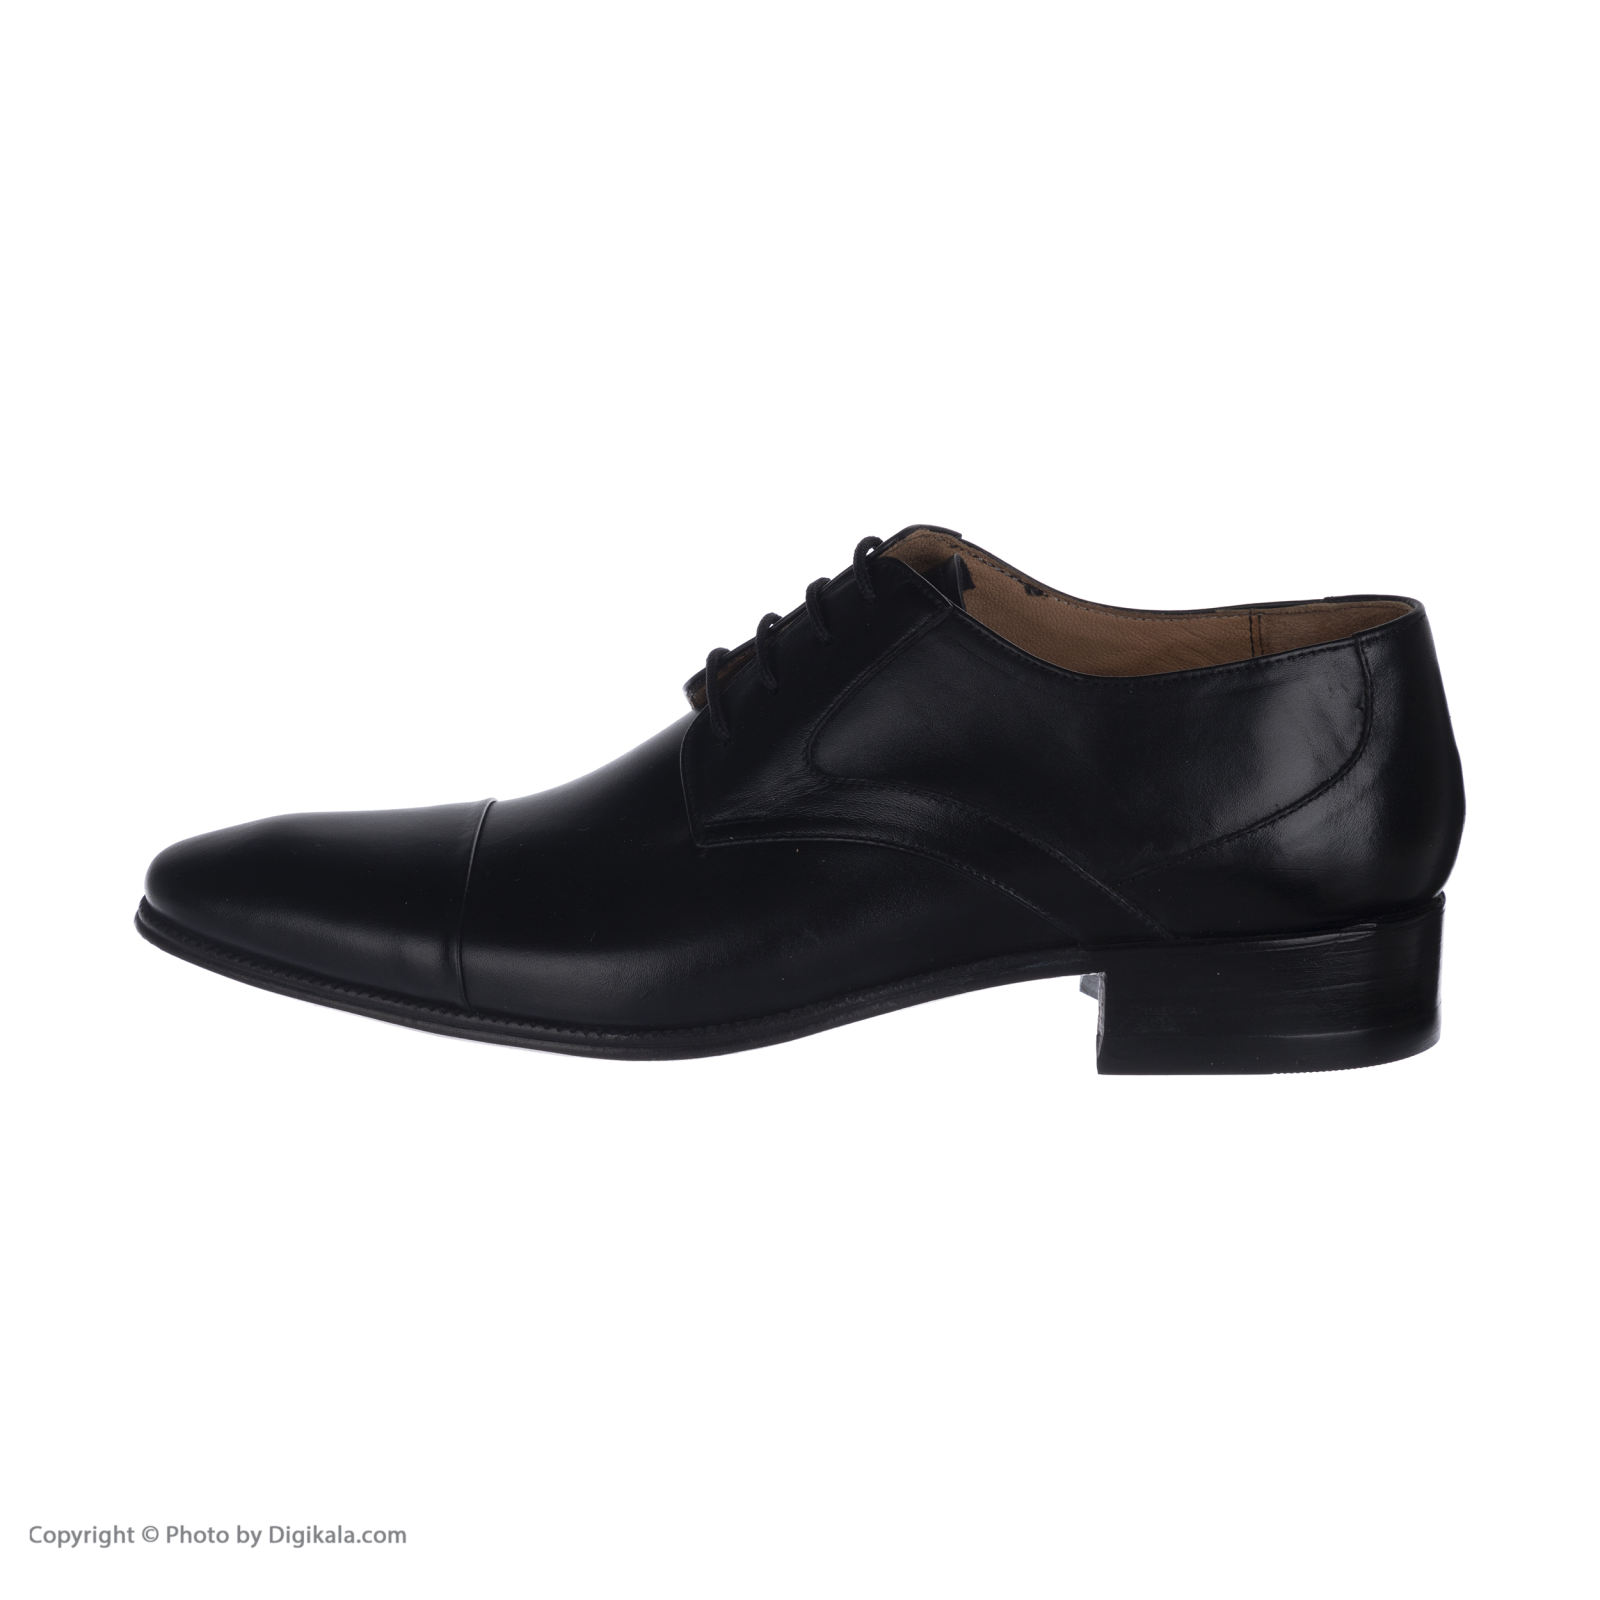 کفش مردانه نظری کد 413 -  - 1